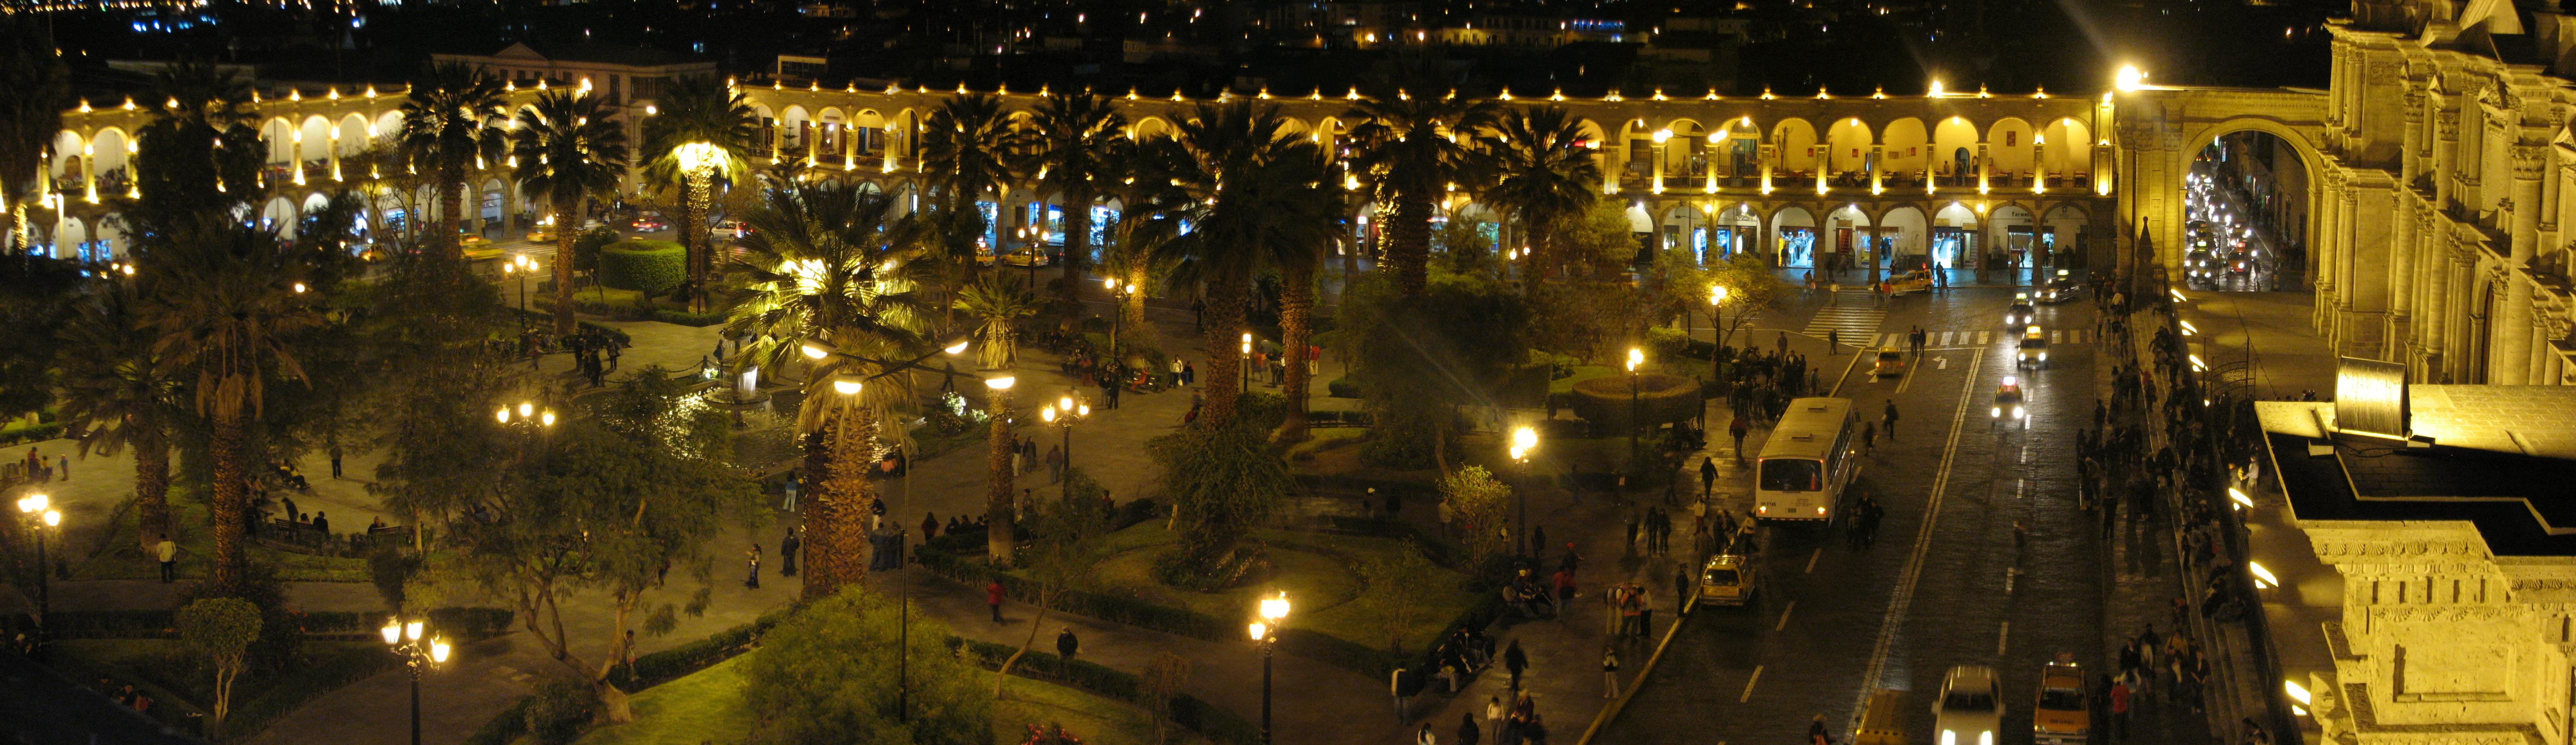 La plaza armas a noche